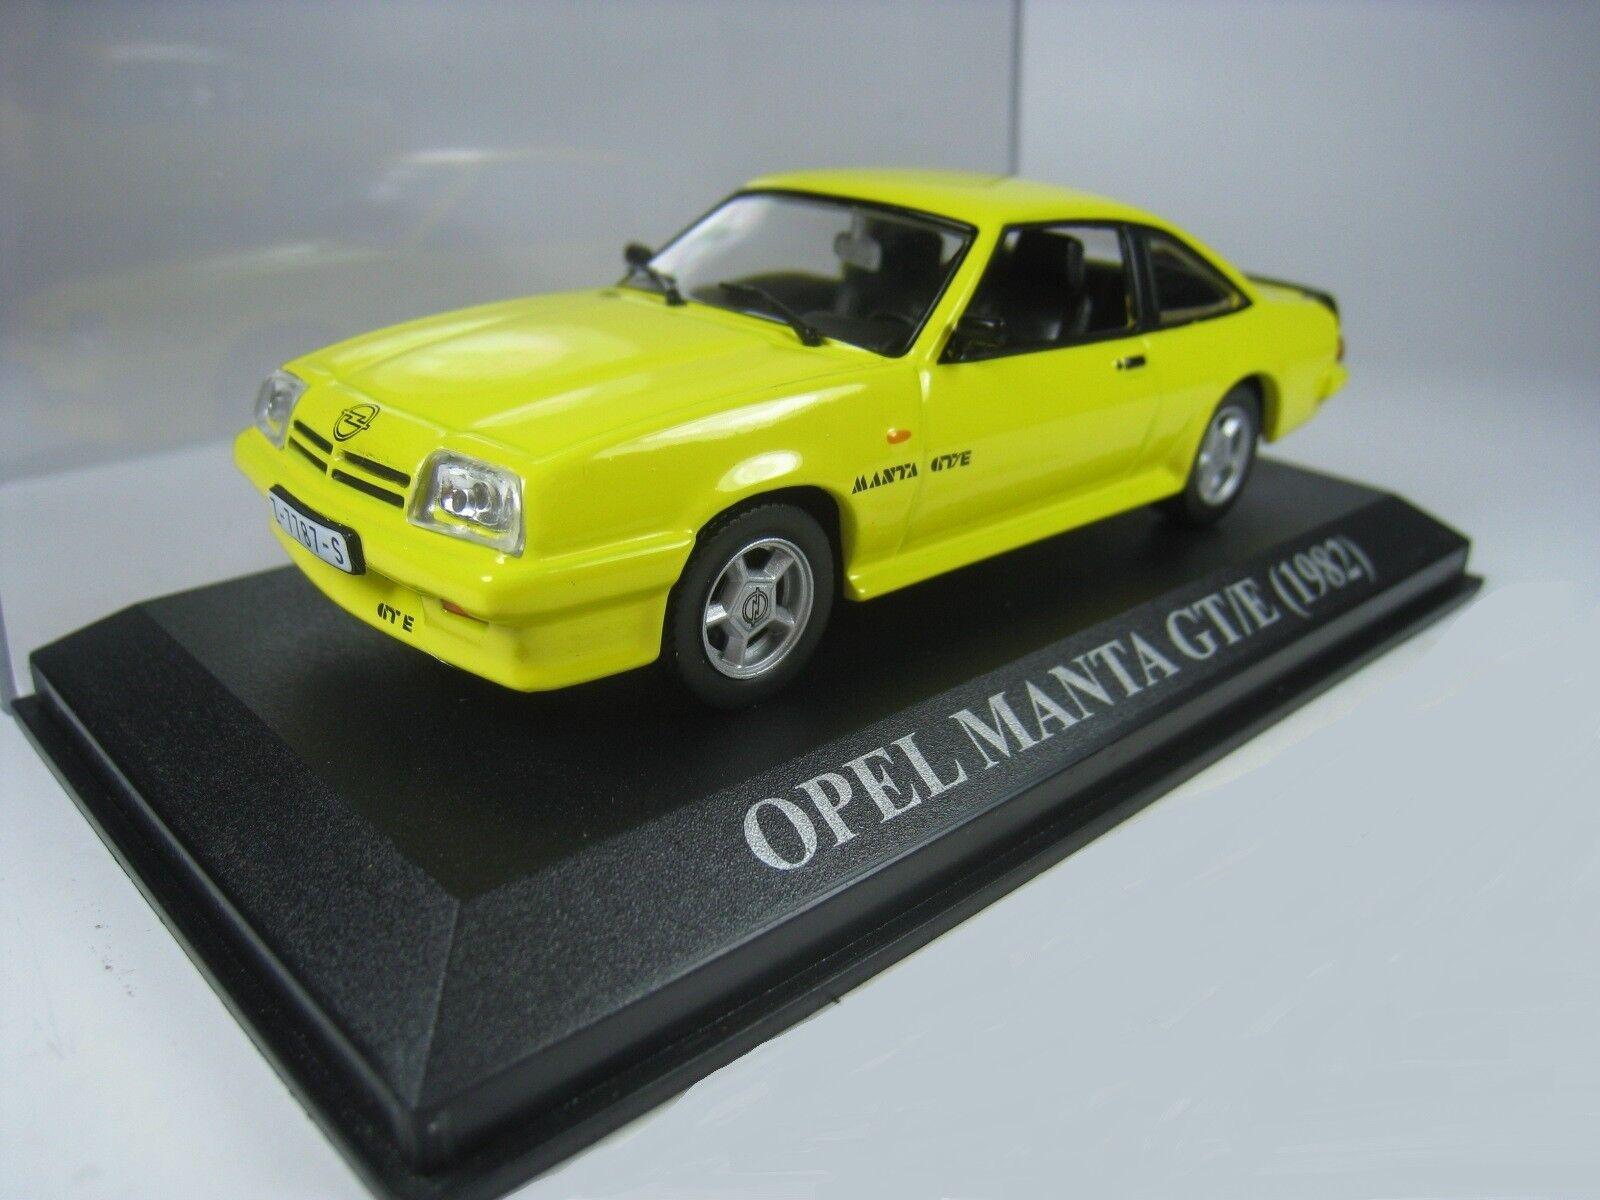 OPEL MANTA GT-E 1982 IXO ALTAYA 1 43 yellow YELLOW NEW yellow DEUTSCHLAND WAGEN